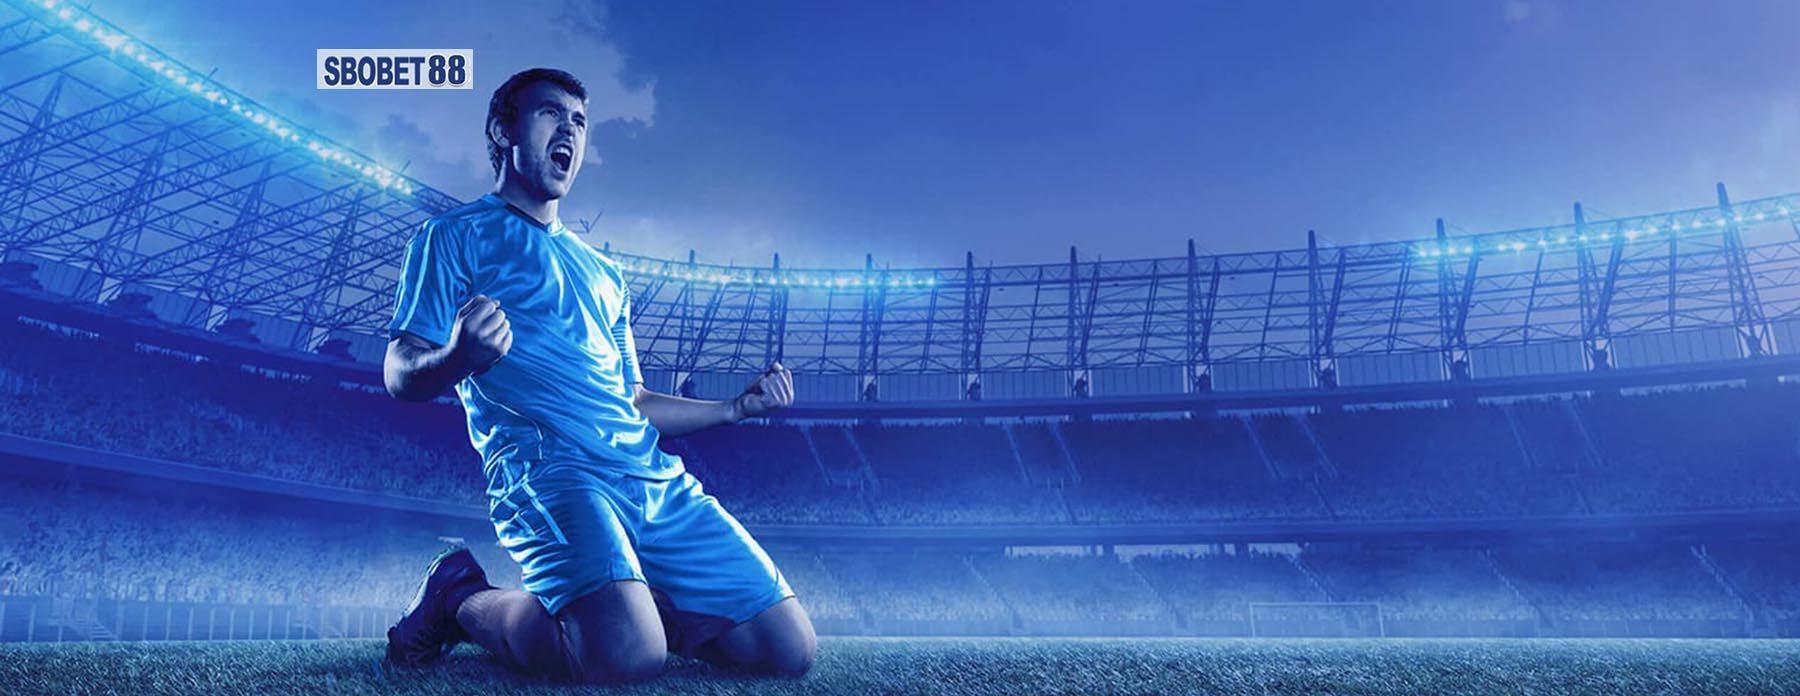 Sbobet Mobile Online Di 2020 Indonesia Sepak Bola